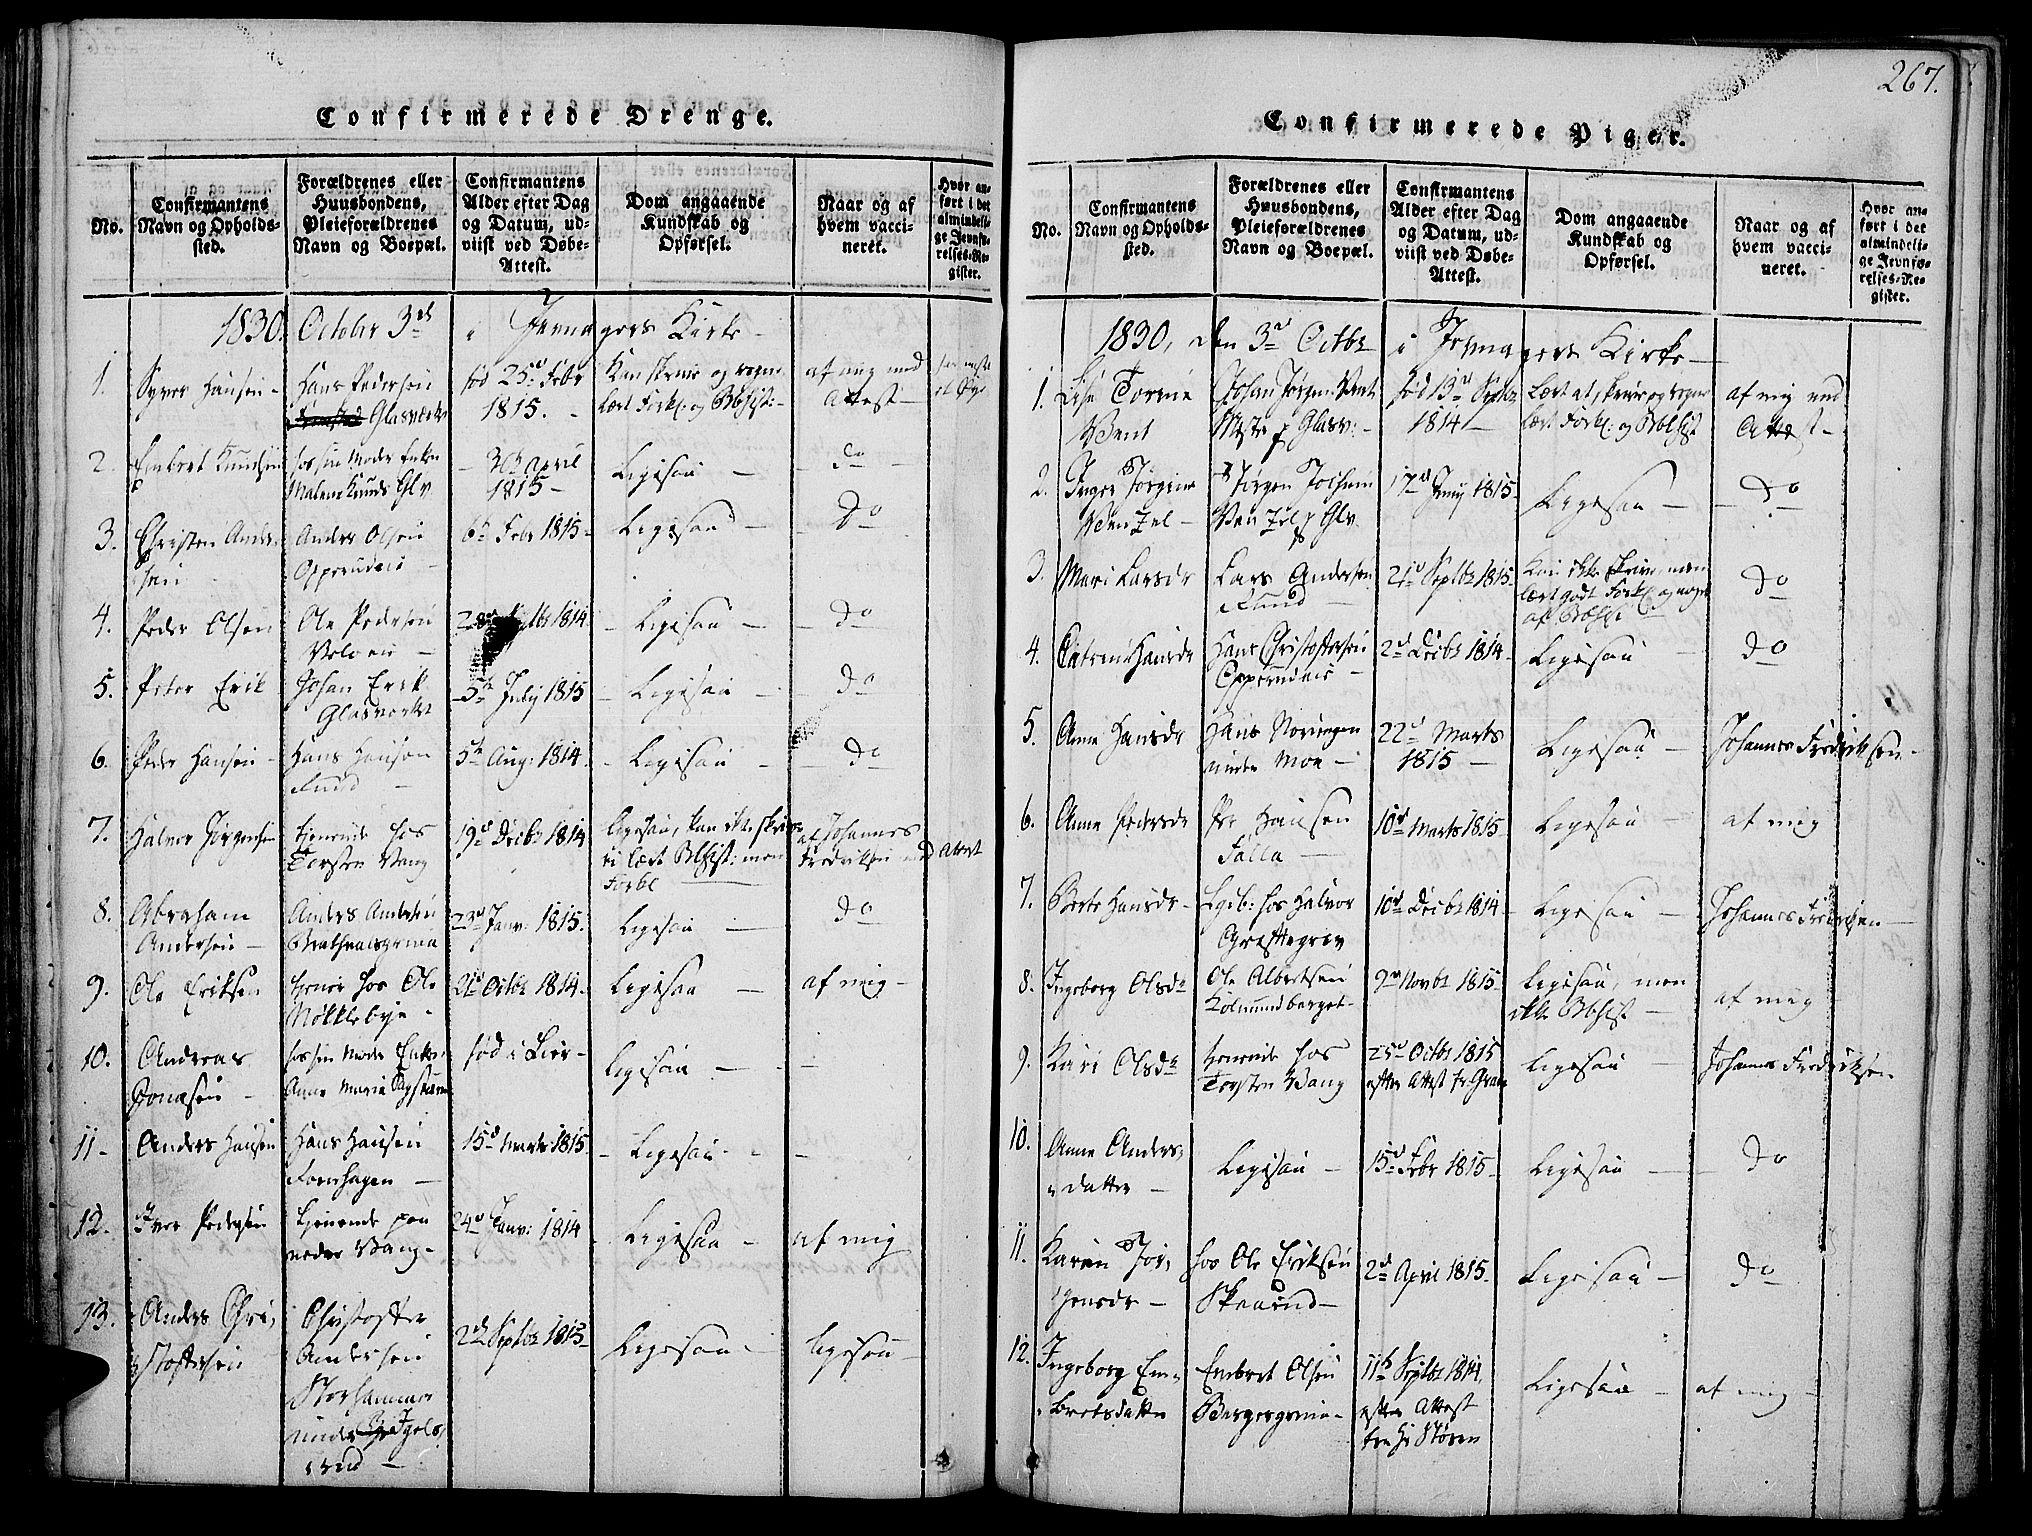 SAH, Jevnaker prestekontor, Ministerialbok nr. 5, 1815-1837, s. 267